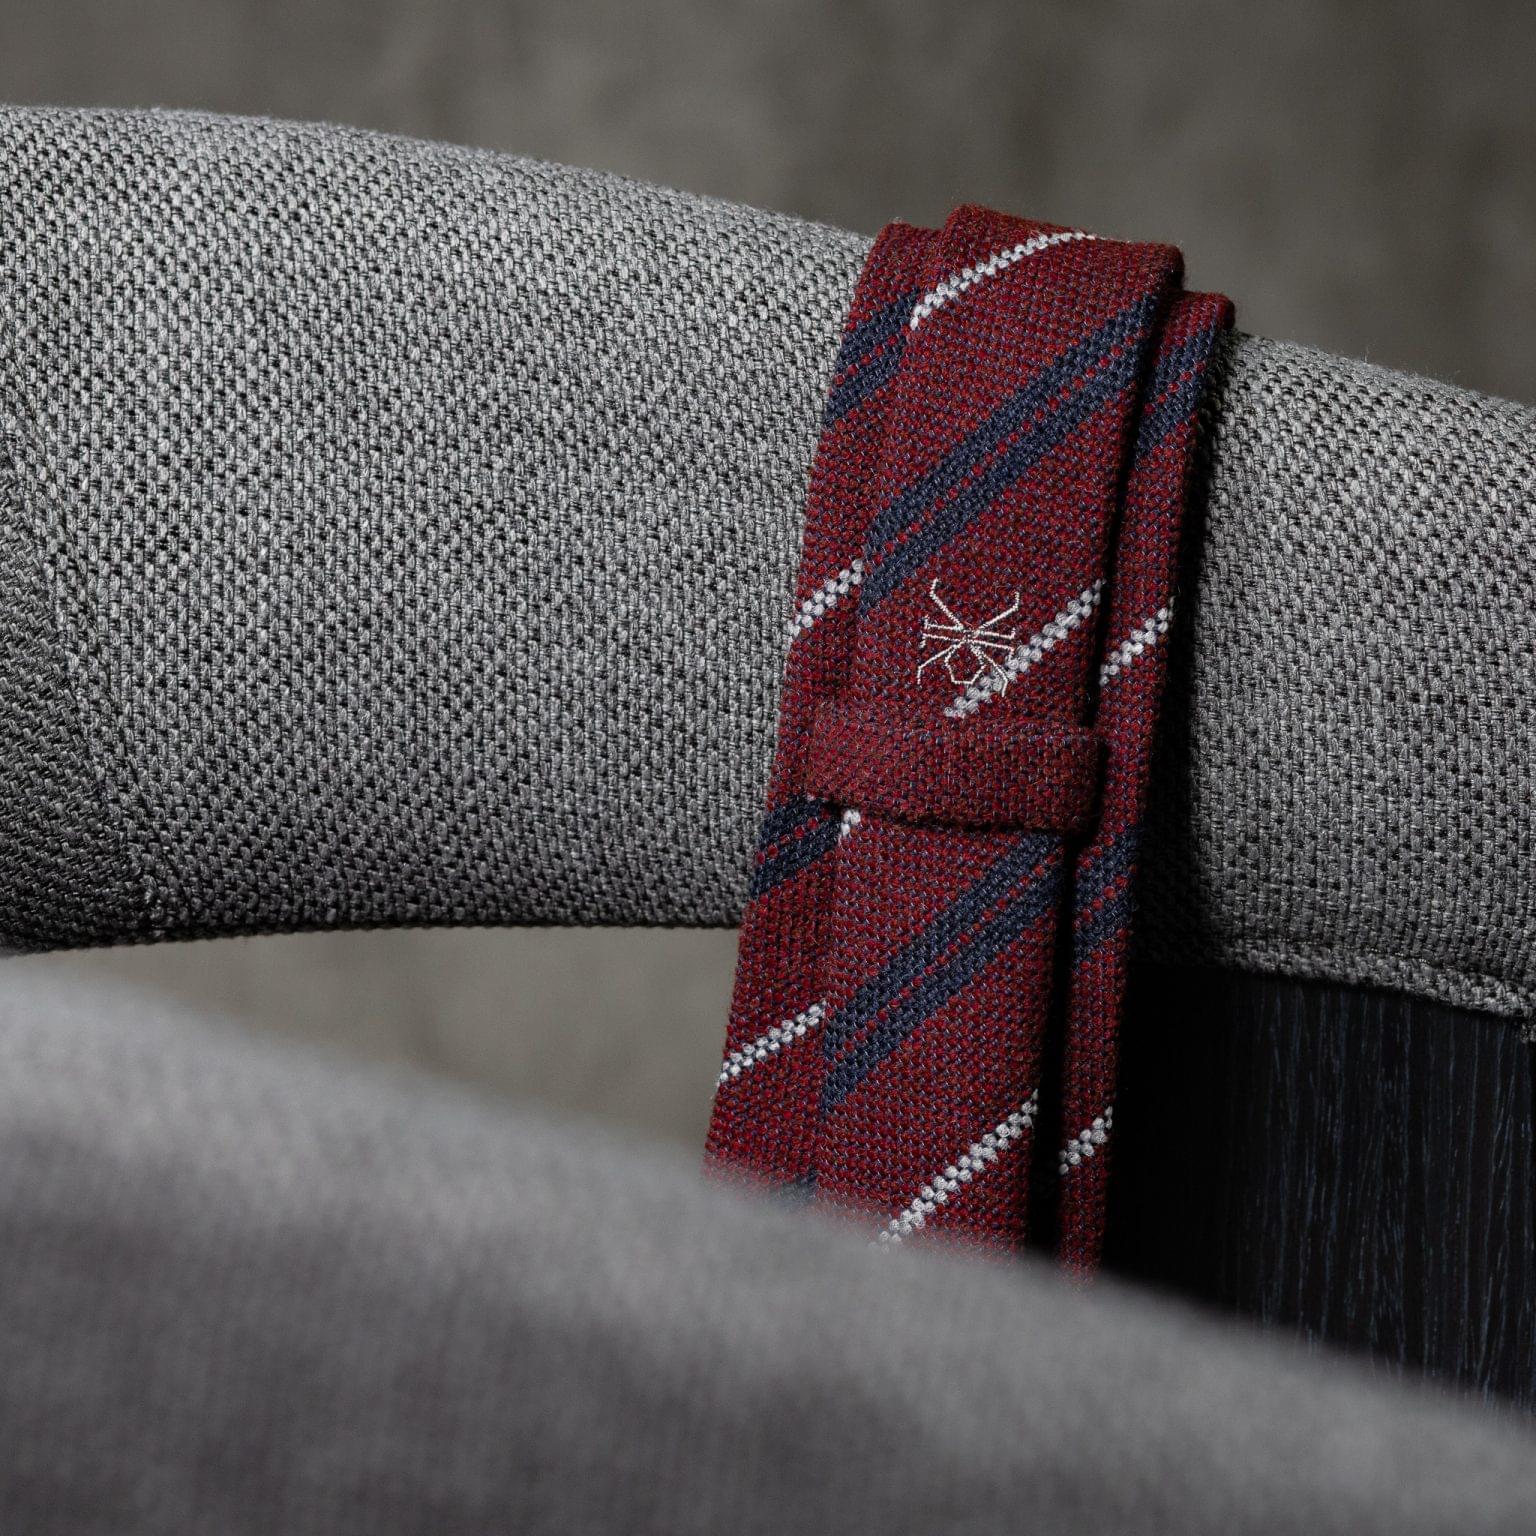 WOOL-LANA-0482-Tie-Initials-Corbata-Iniciales-The-Seelk-4